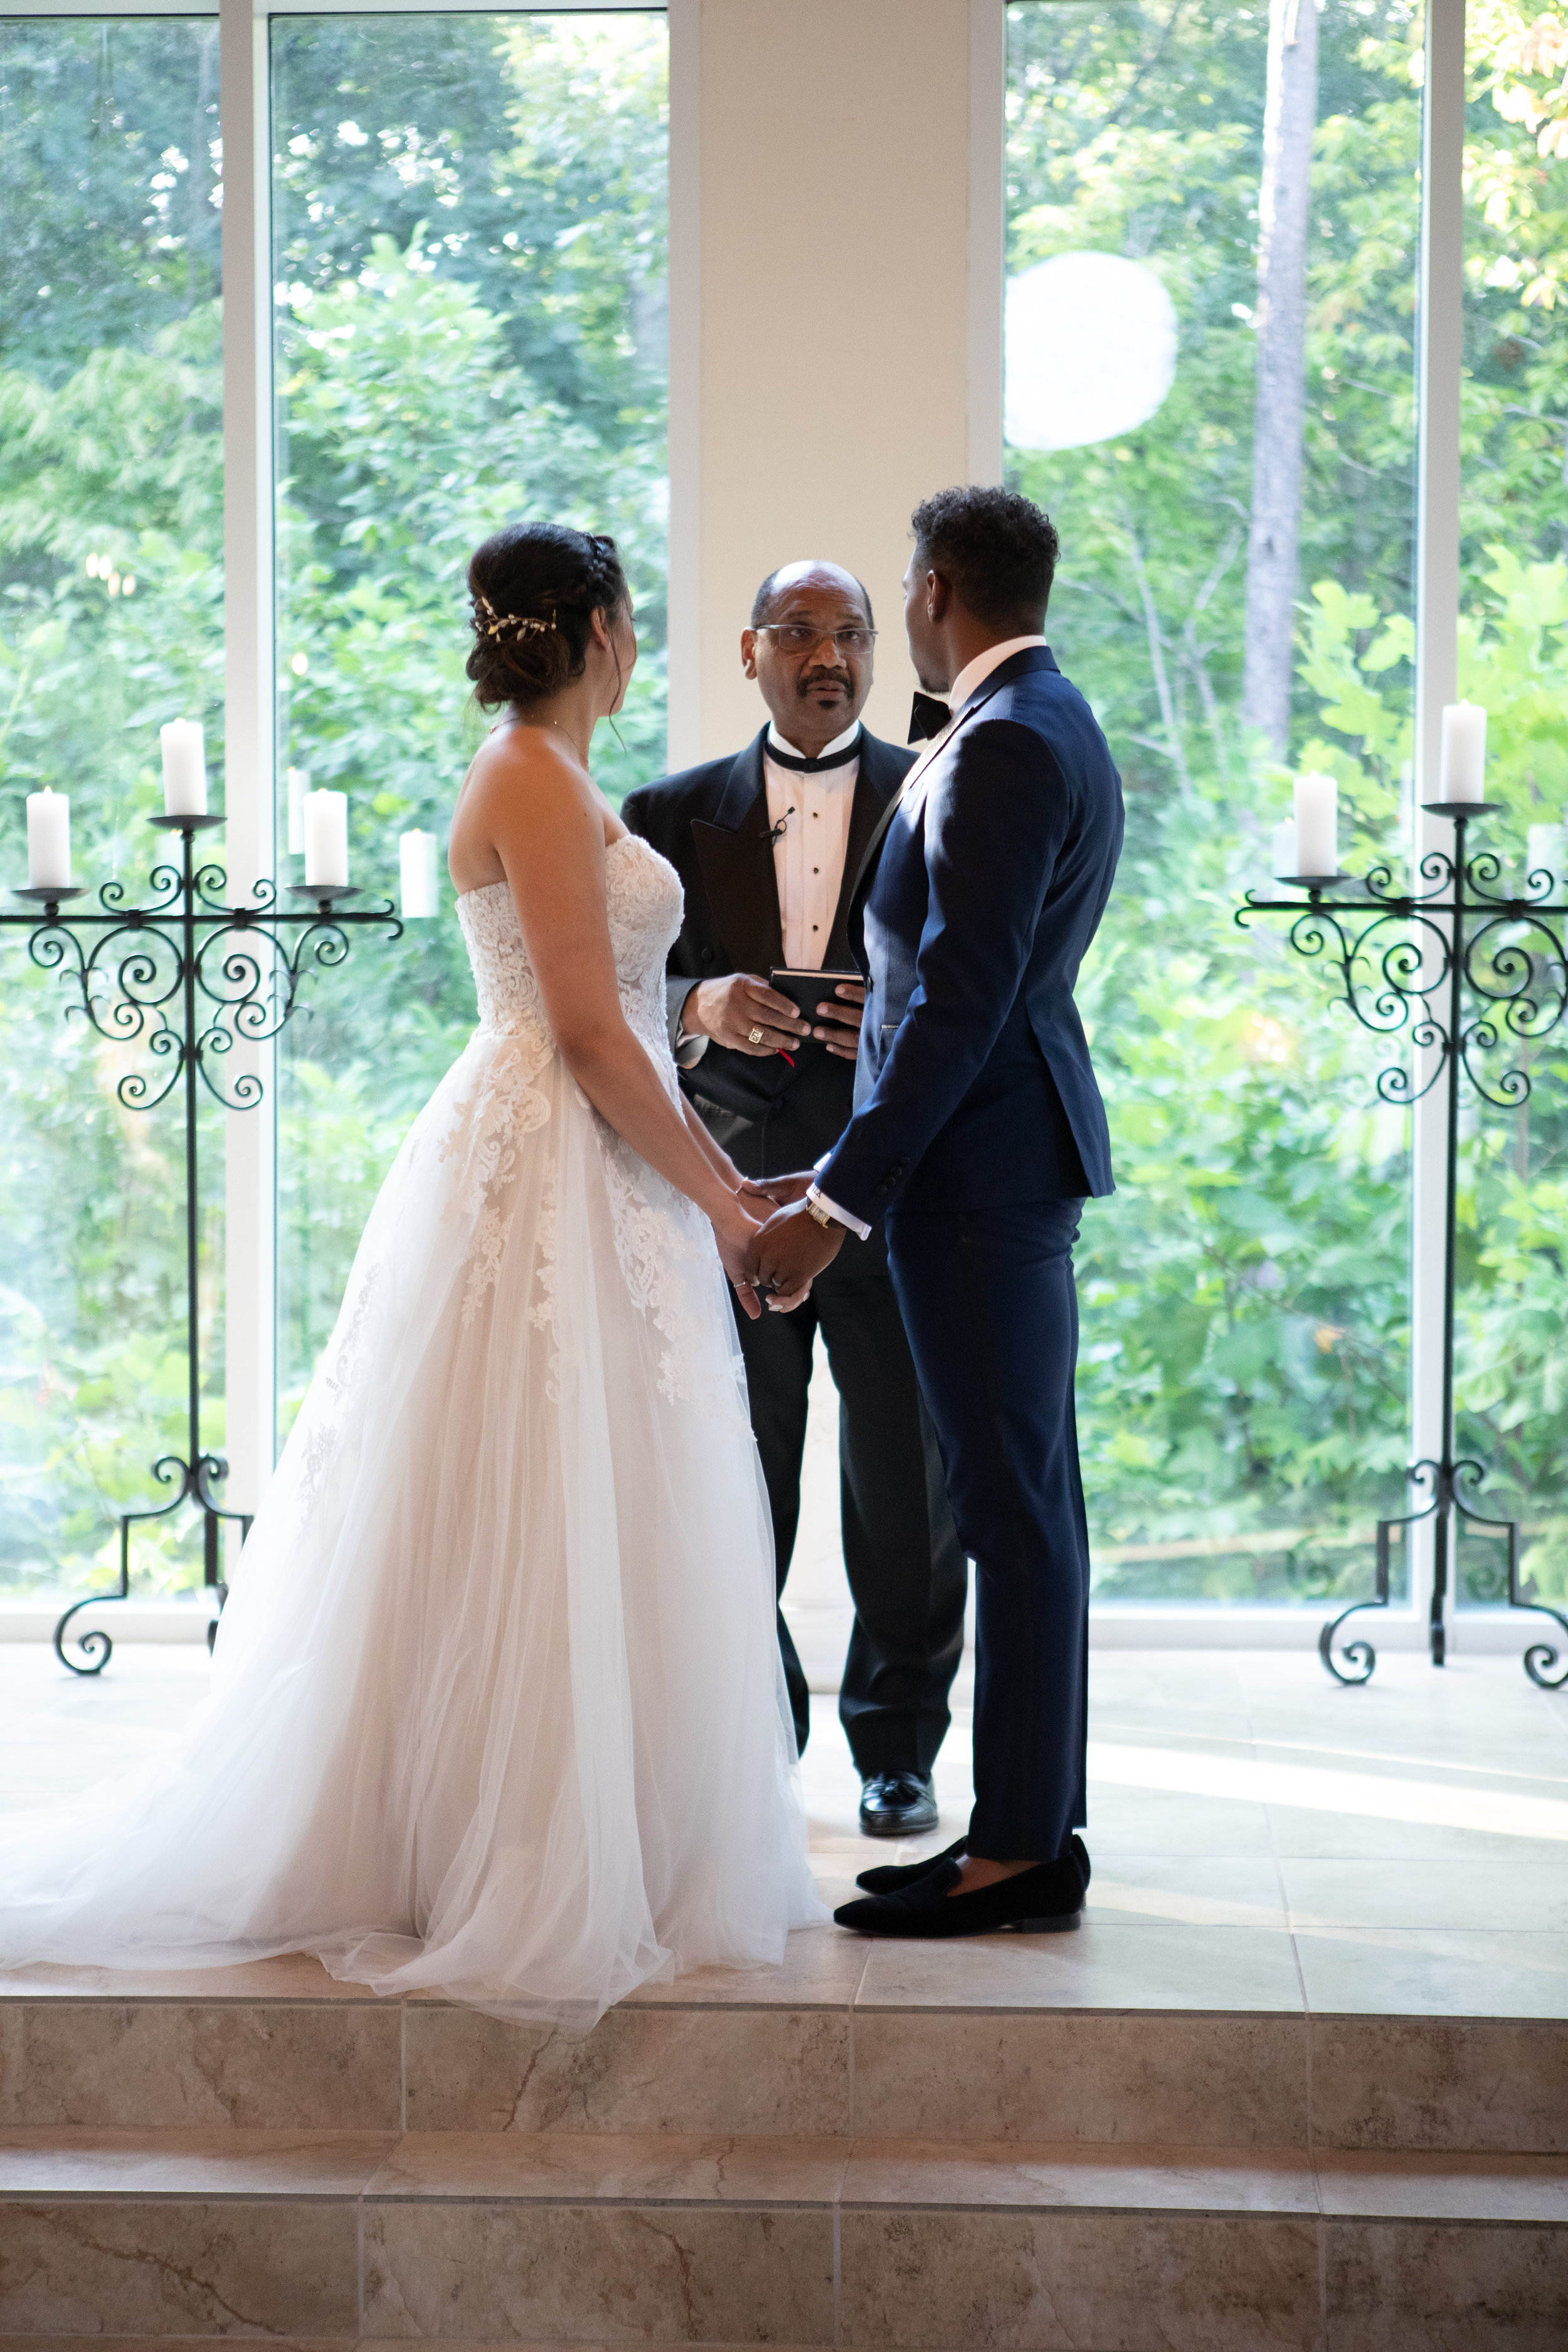 Wedding vows photo by the Atlanta wedding photographers at AtlantaArtisticWeddings